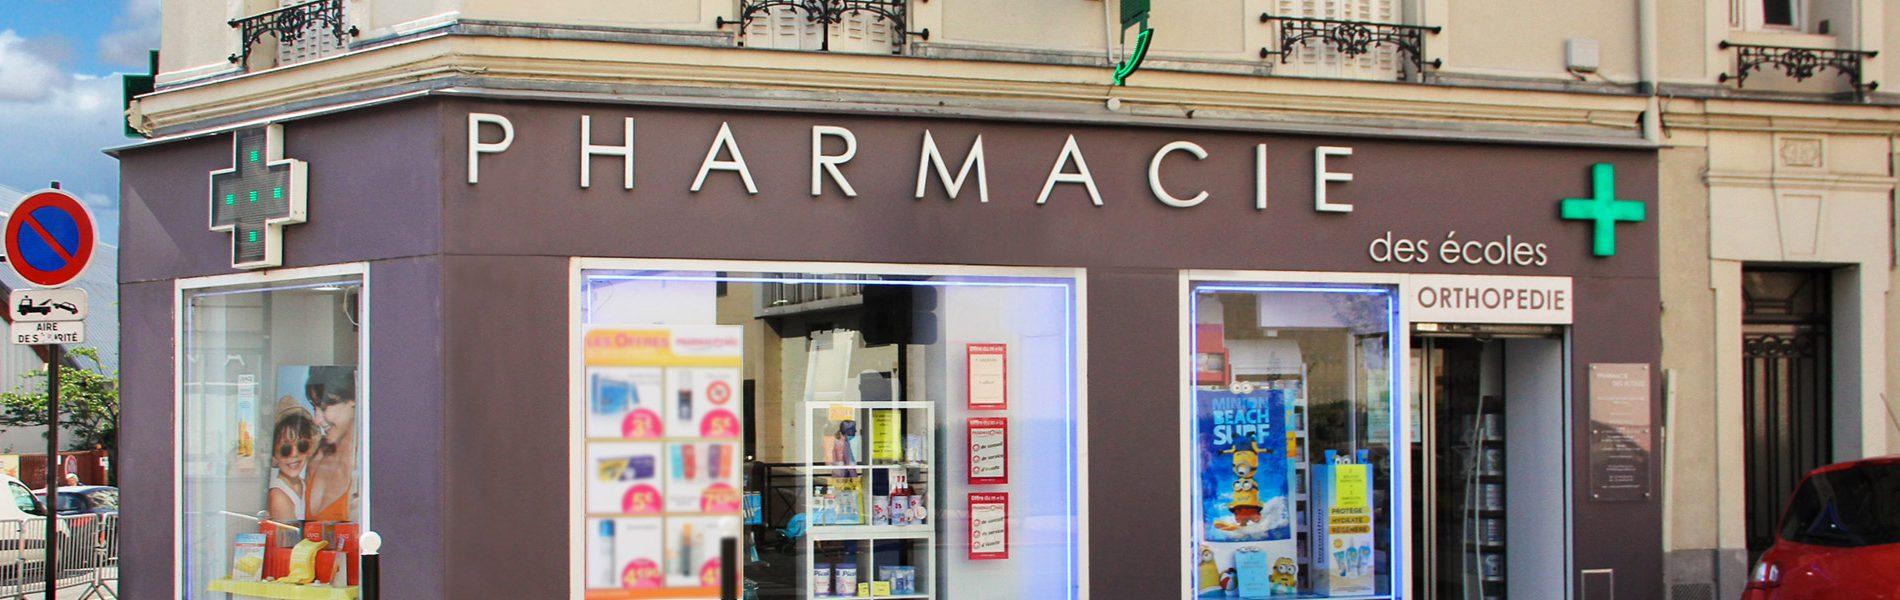 Pharmacie DES ECOLES - Image Homepage 1